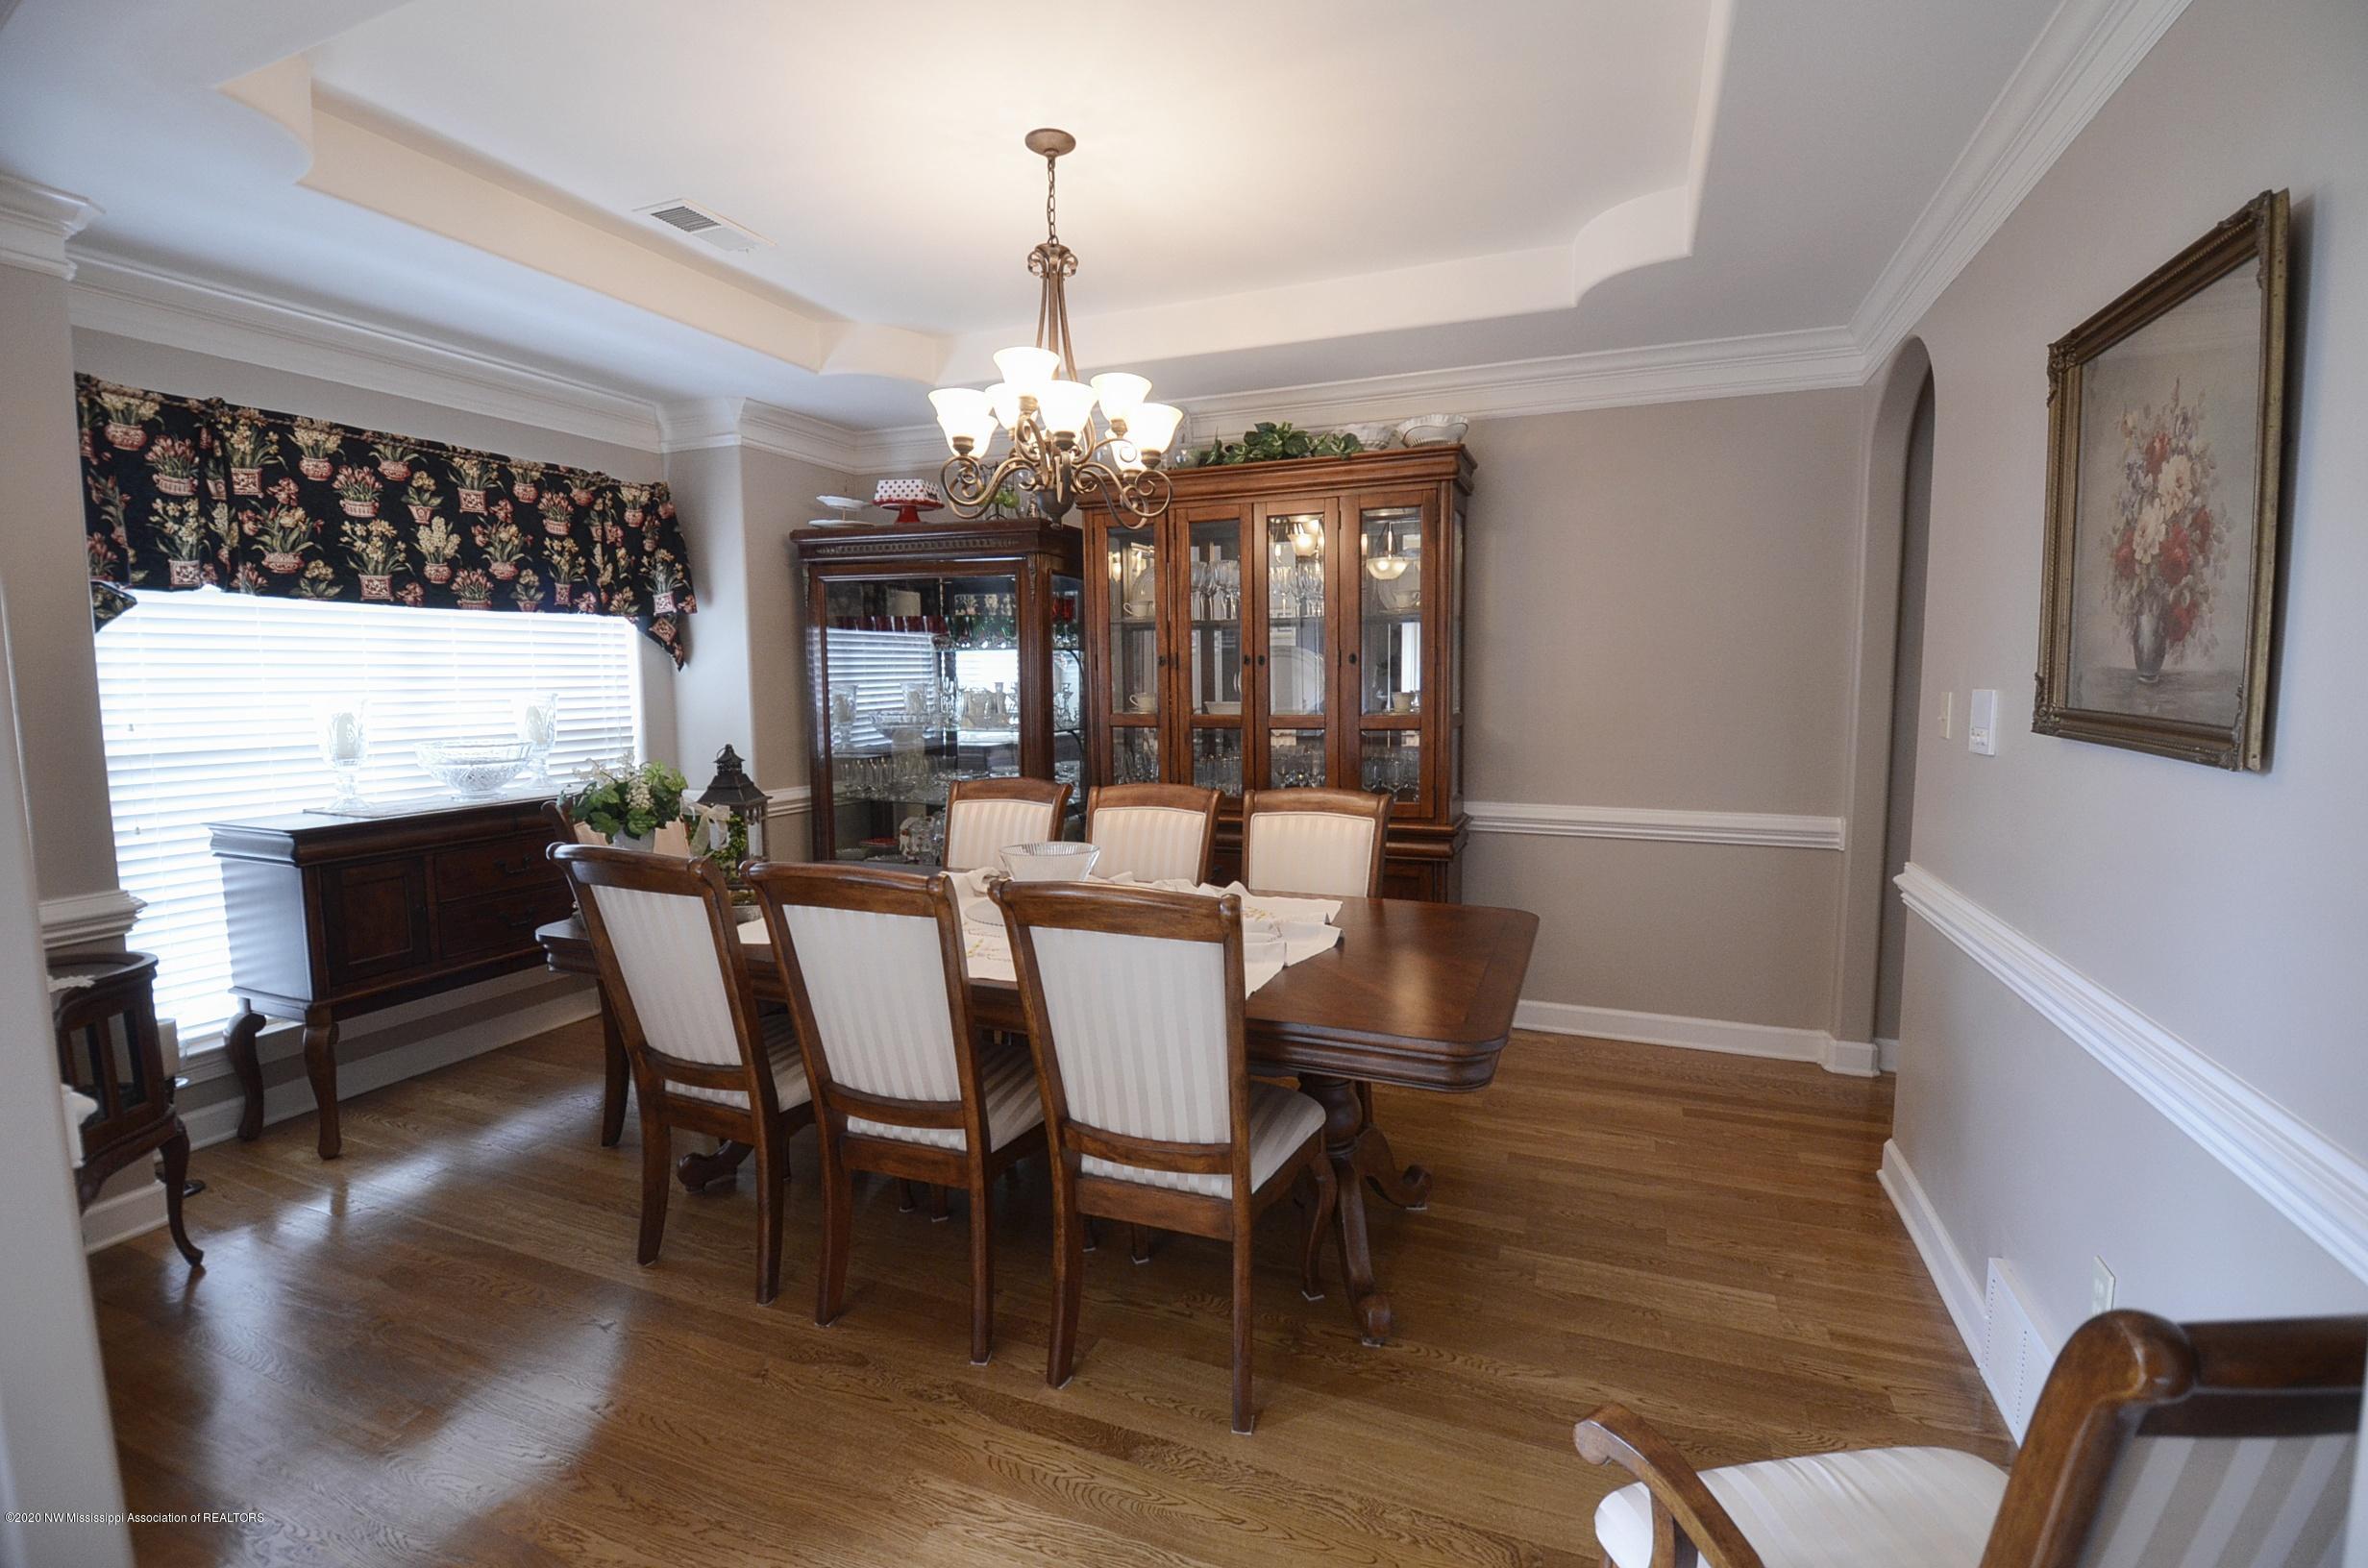 1233 Greers Landing, DeSoto, Mississippi 38632, 6 Bedrooms Bedrooms, ,4 BathroomsBathrooms,Residential,For Sale,Greers Landing,330521